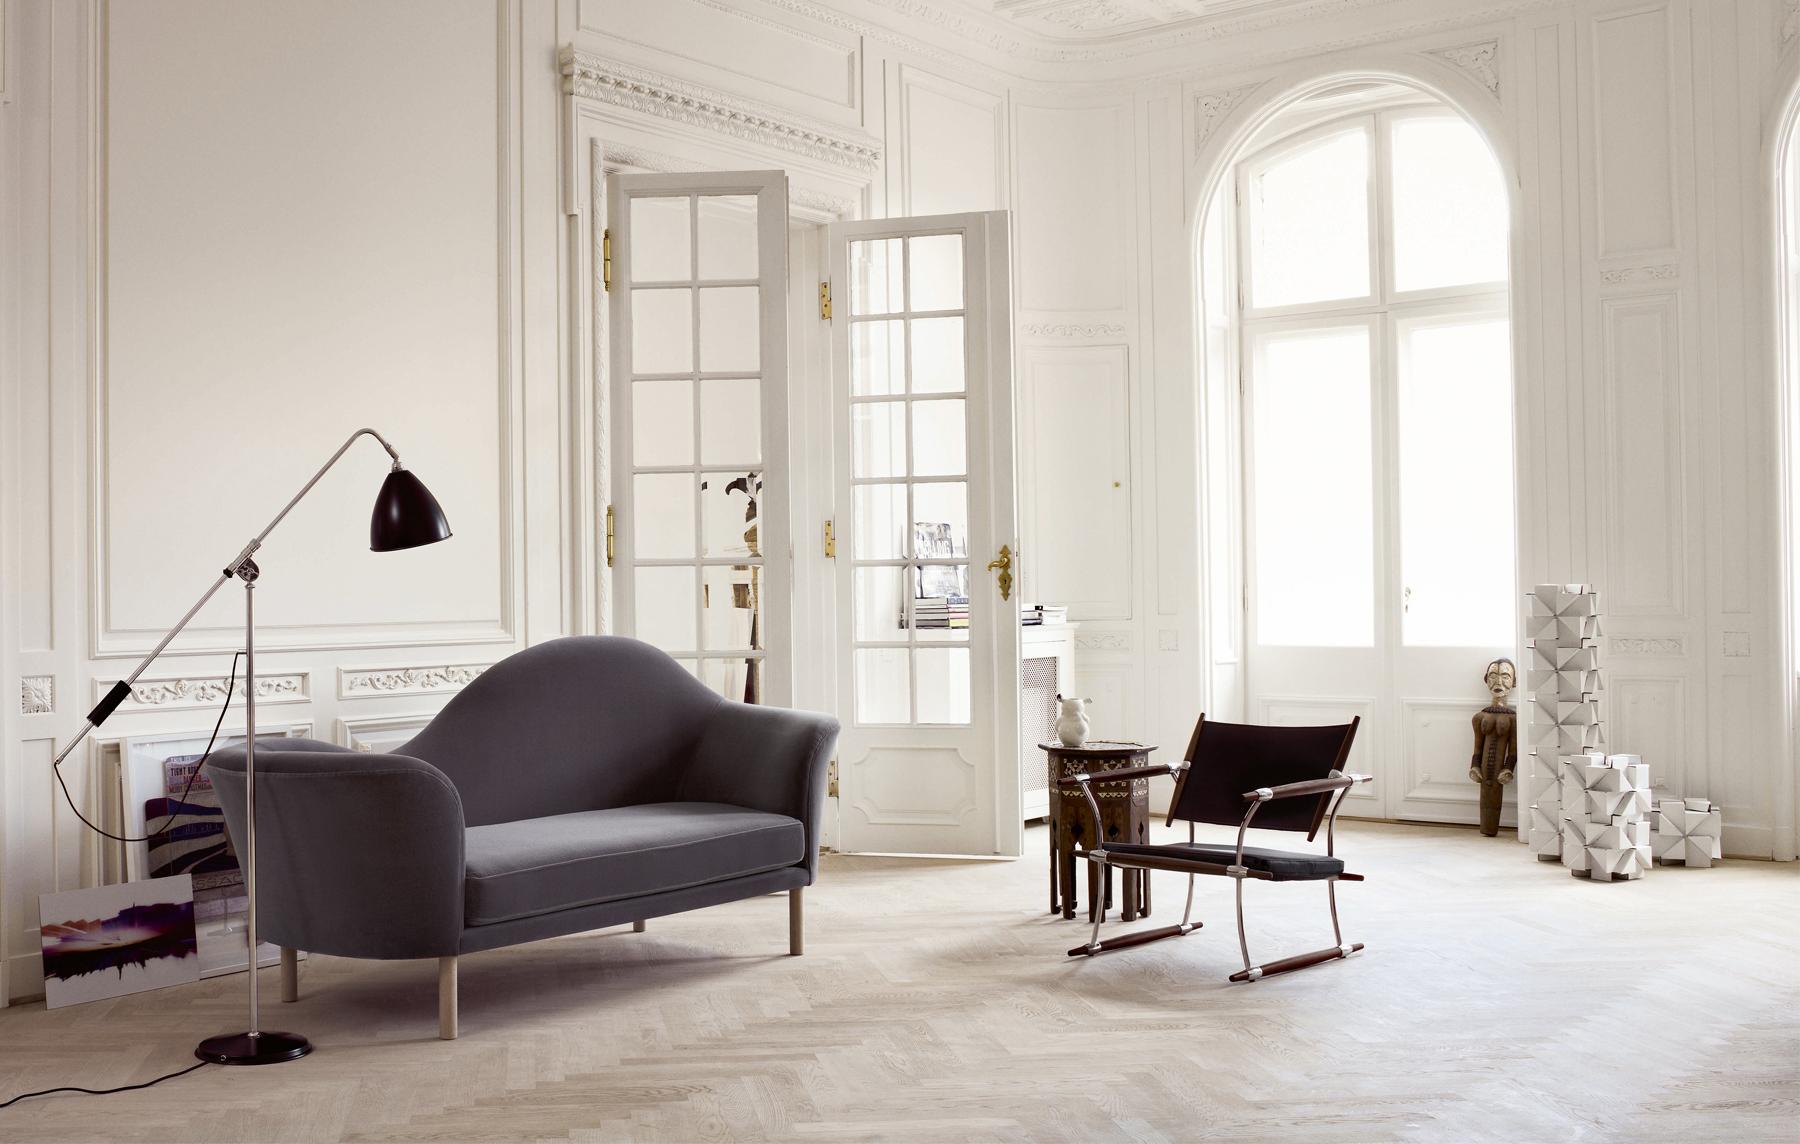 Interior Inspiration from Gubi Denmark  Trendland